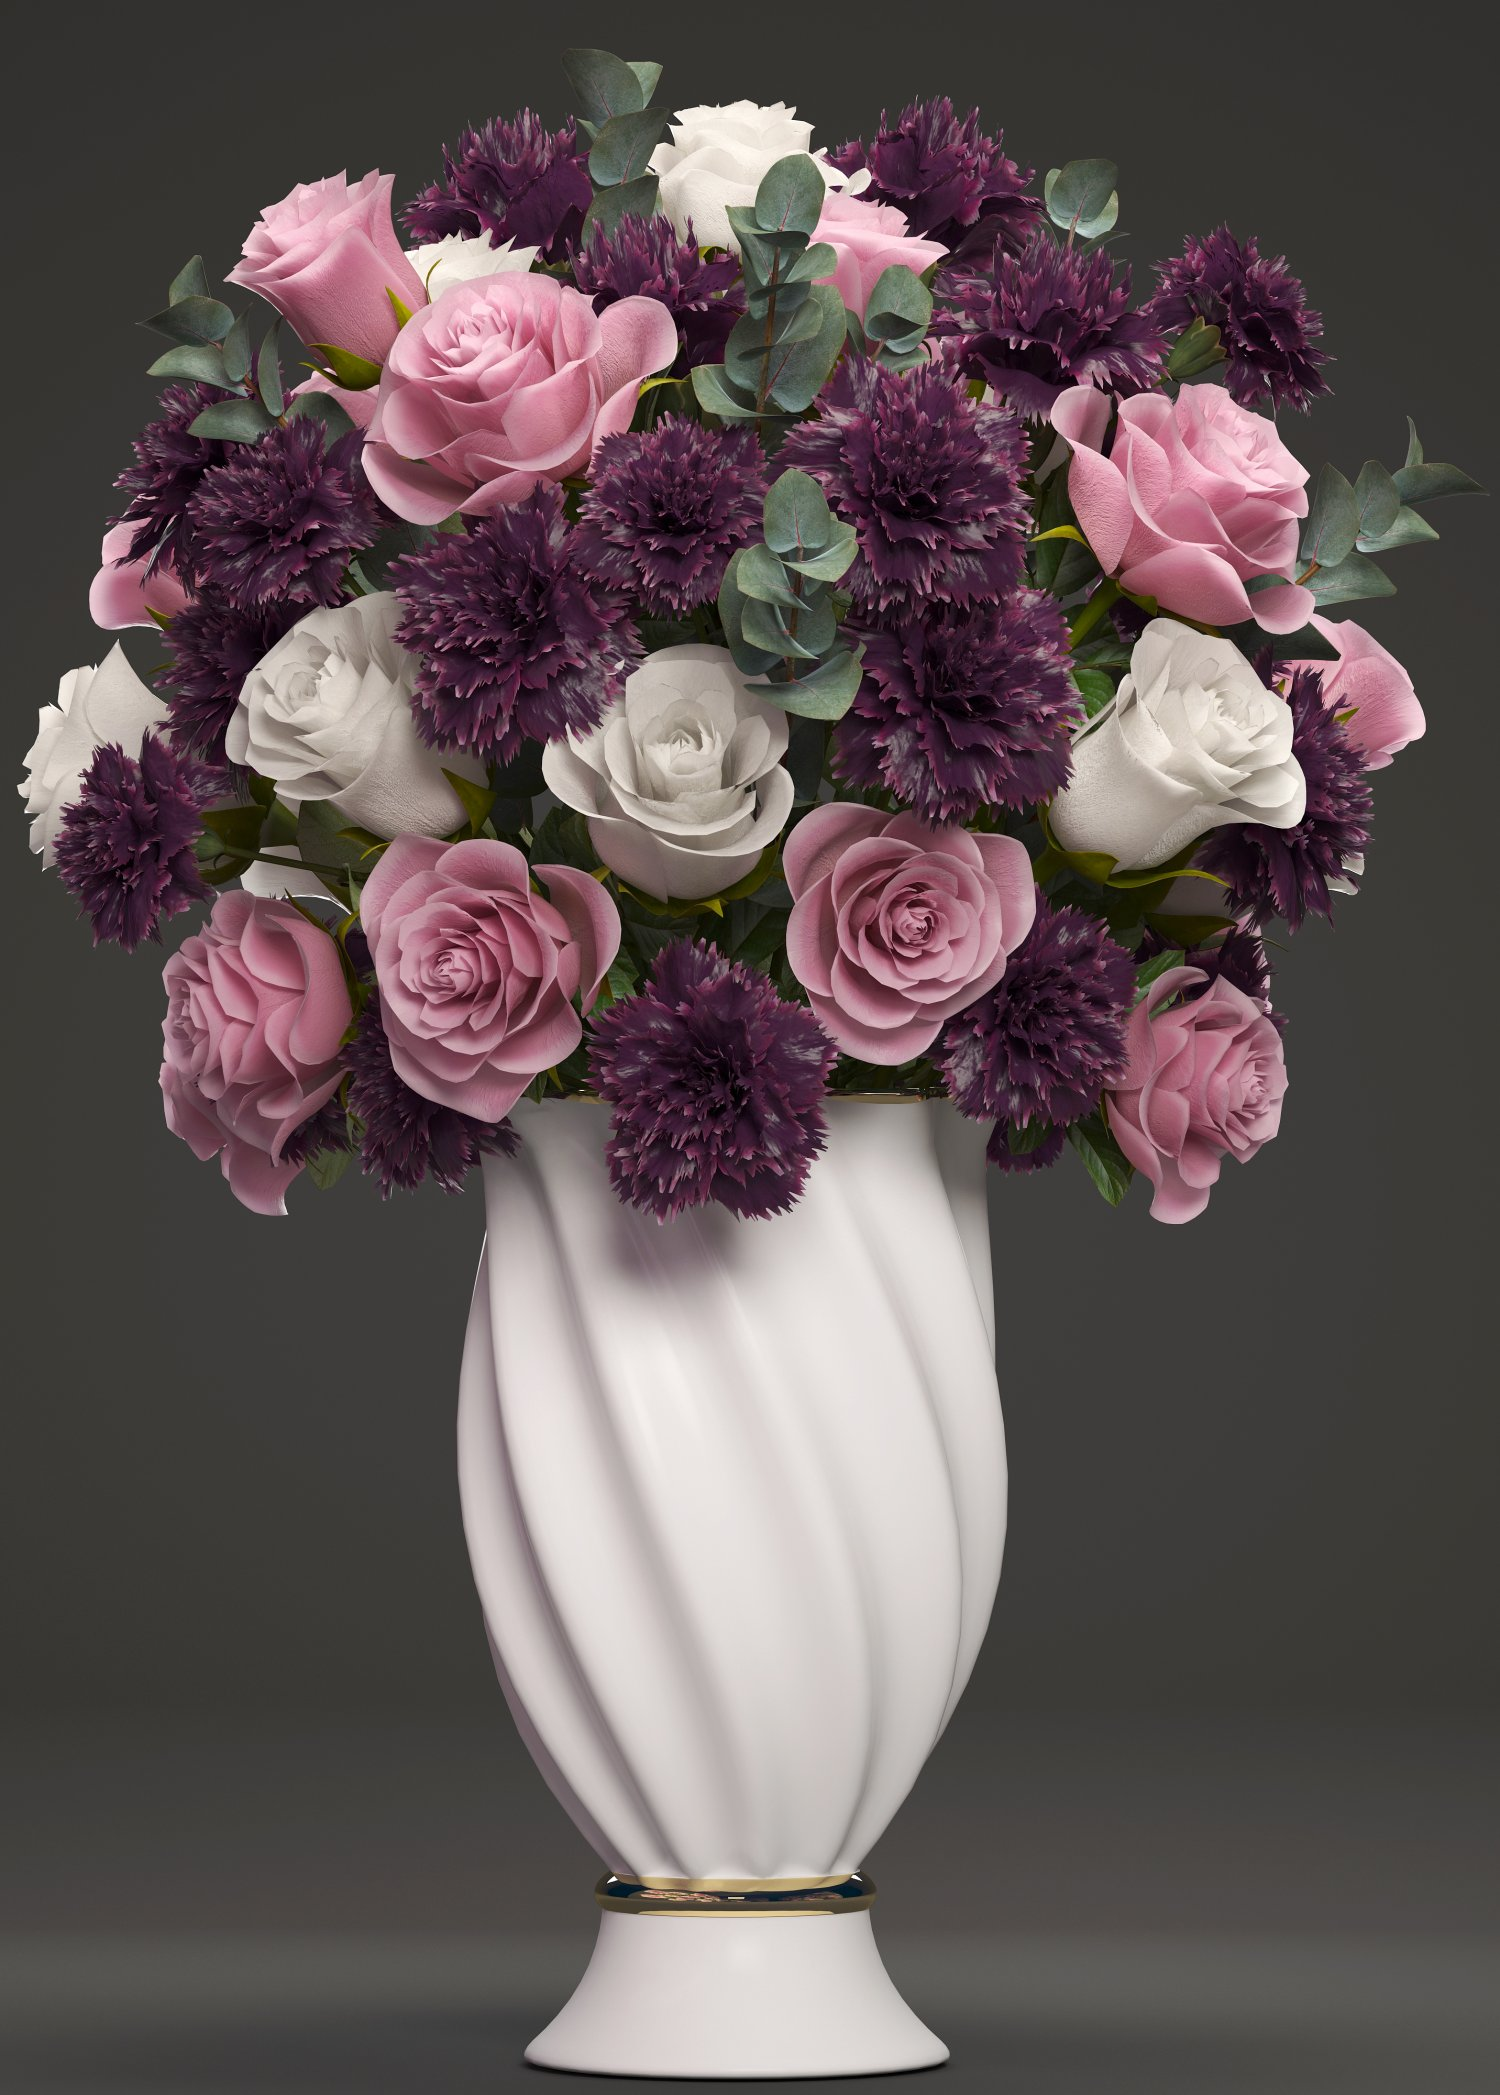 Bouquet Of Flowers In A Vase 3d Model In Flowers 3dexport